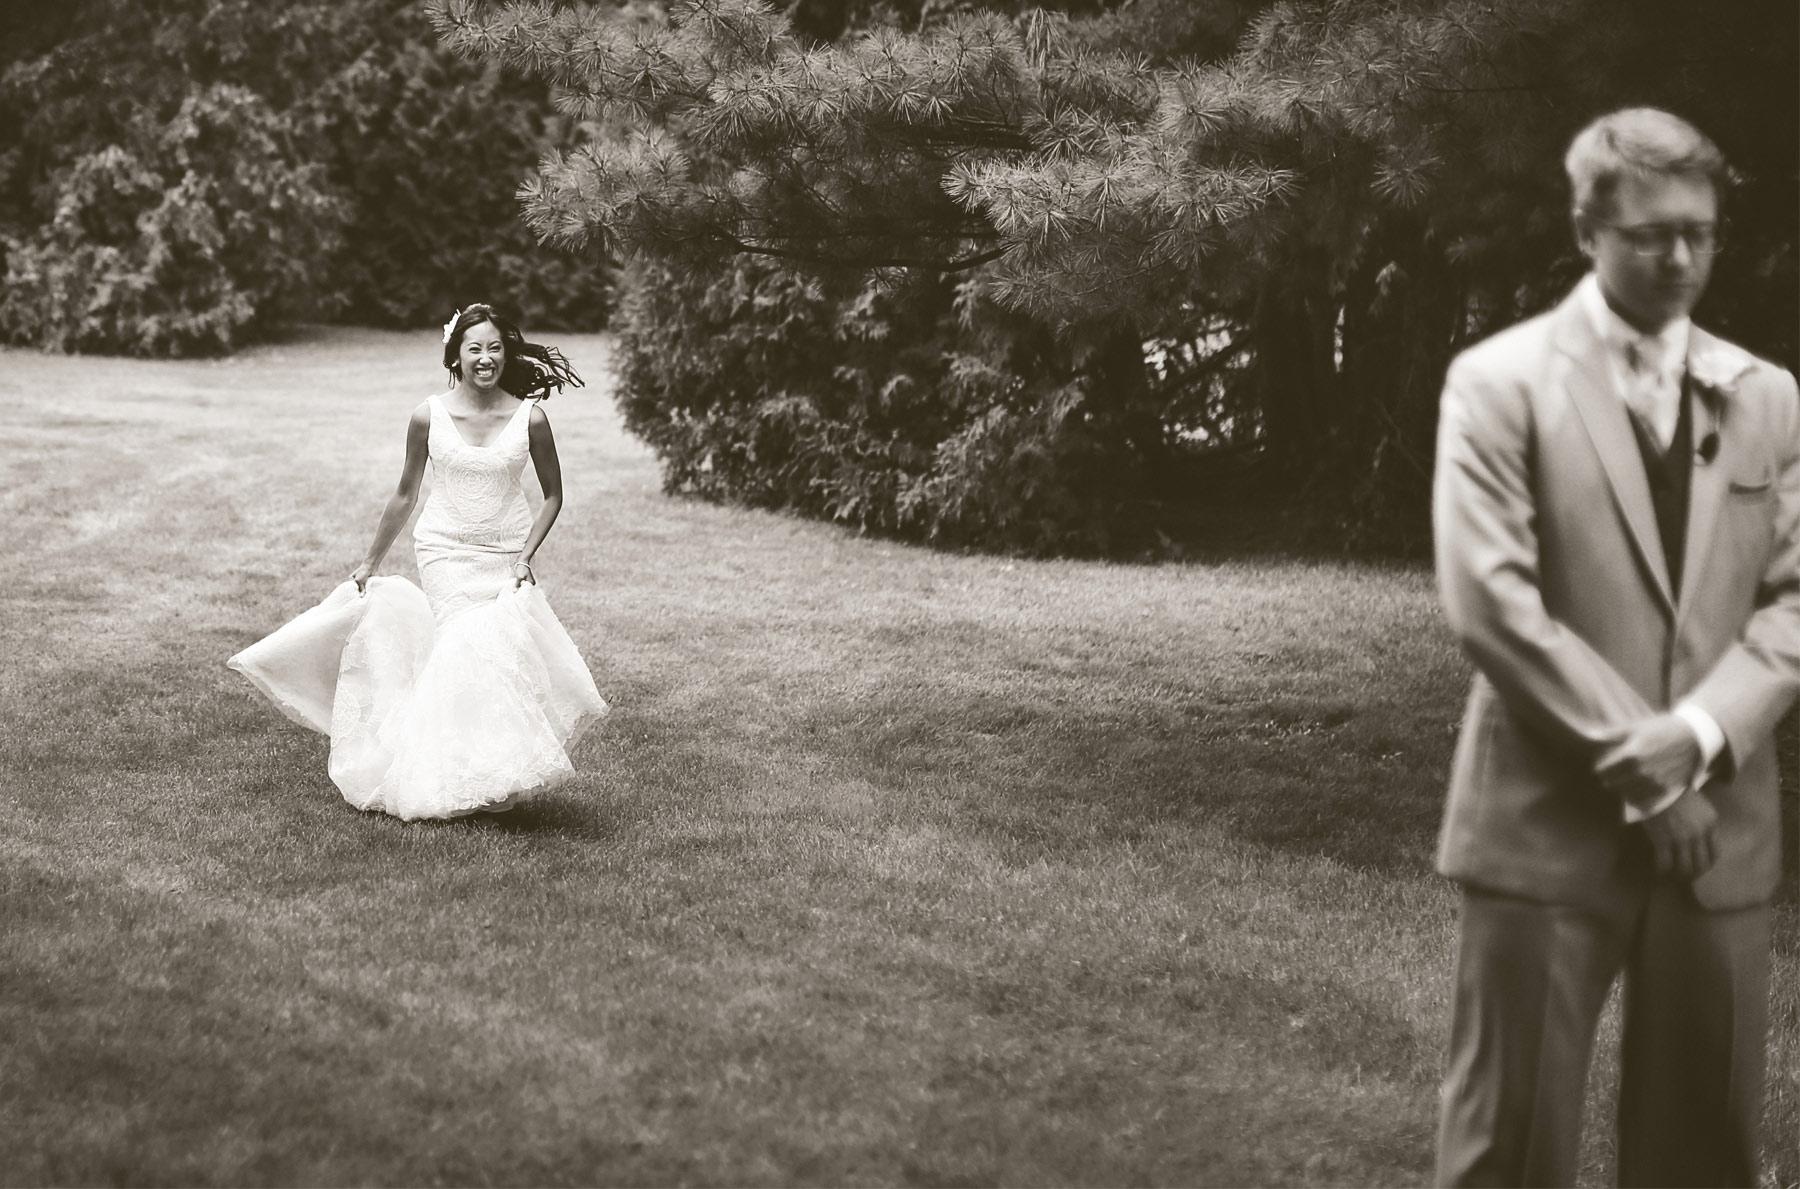 01-Minneapolis-Minnesota-Wedding-Photography-by-Vick-Photography-Garden-First-Look-Daphne-&-Austin.jpg